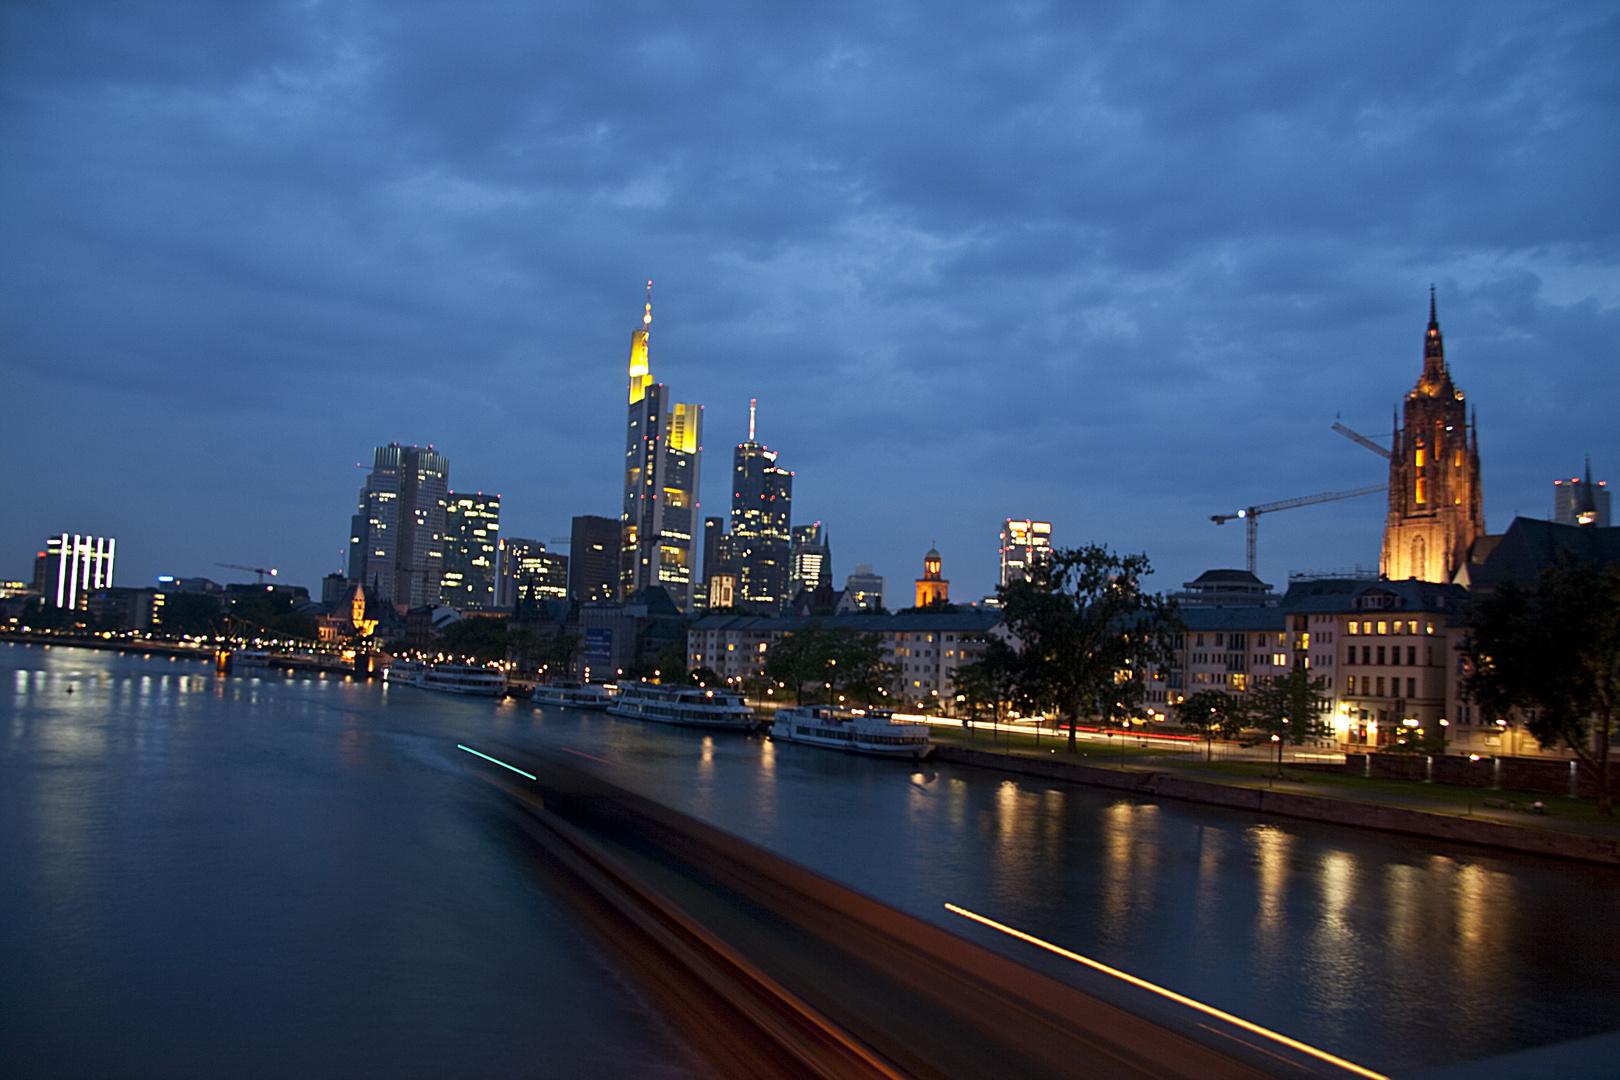 Frankfurt in motion